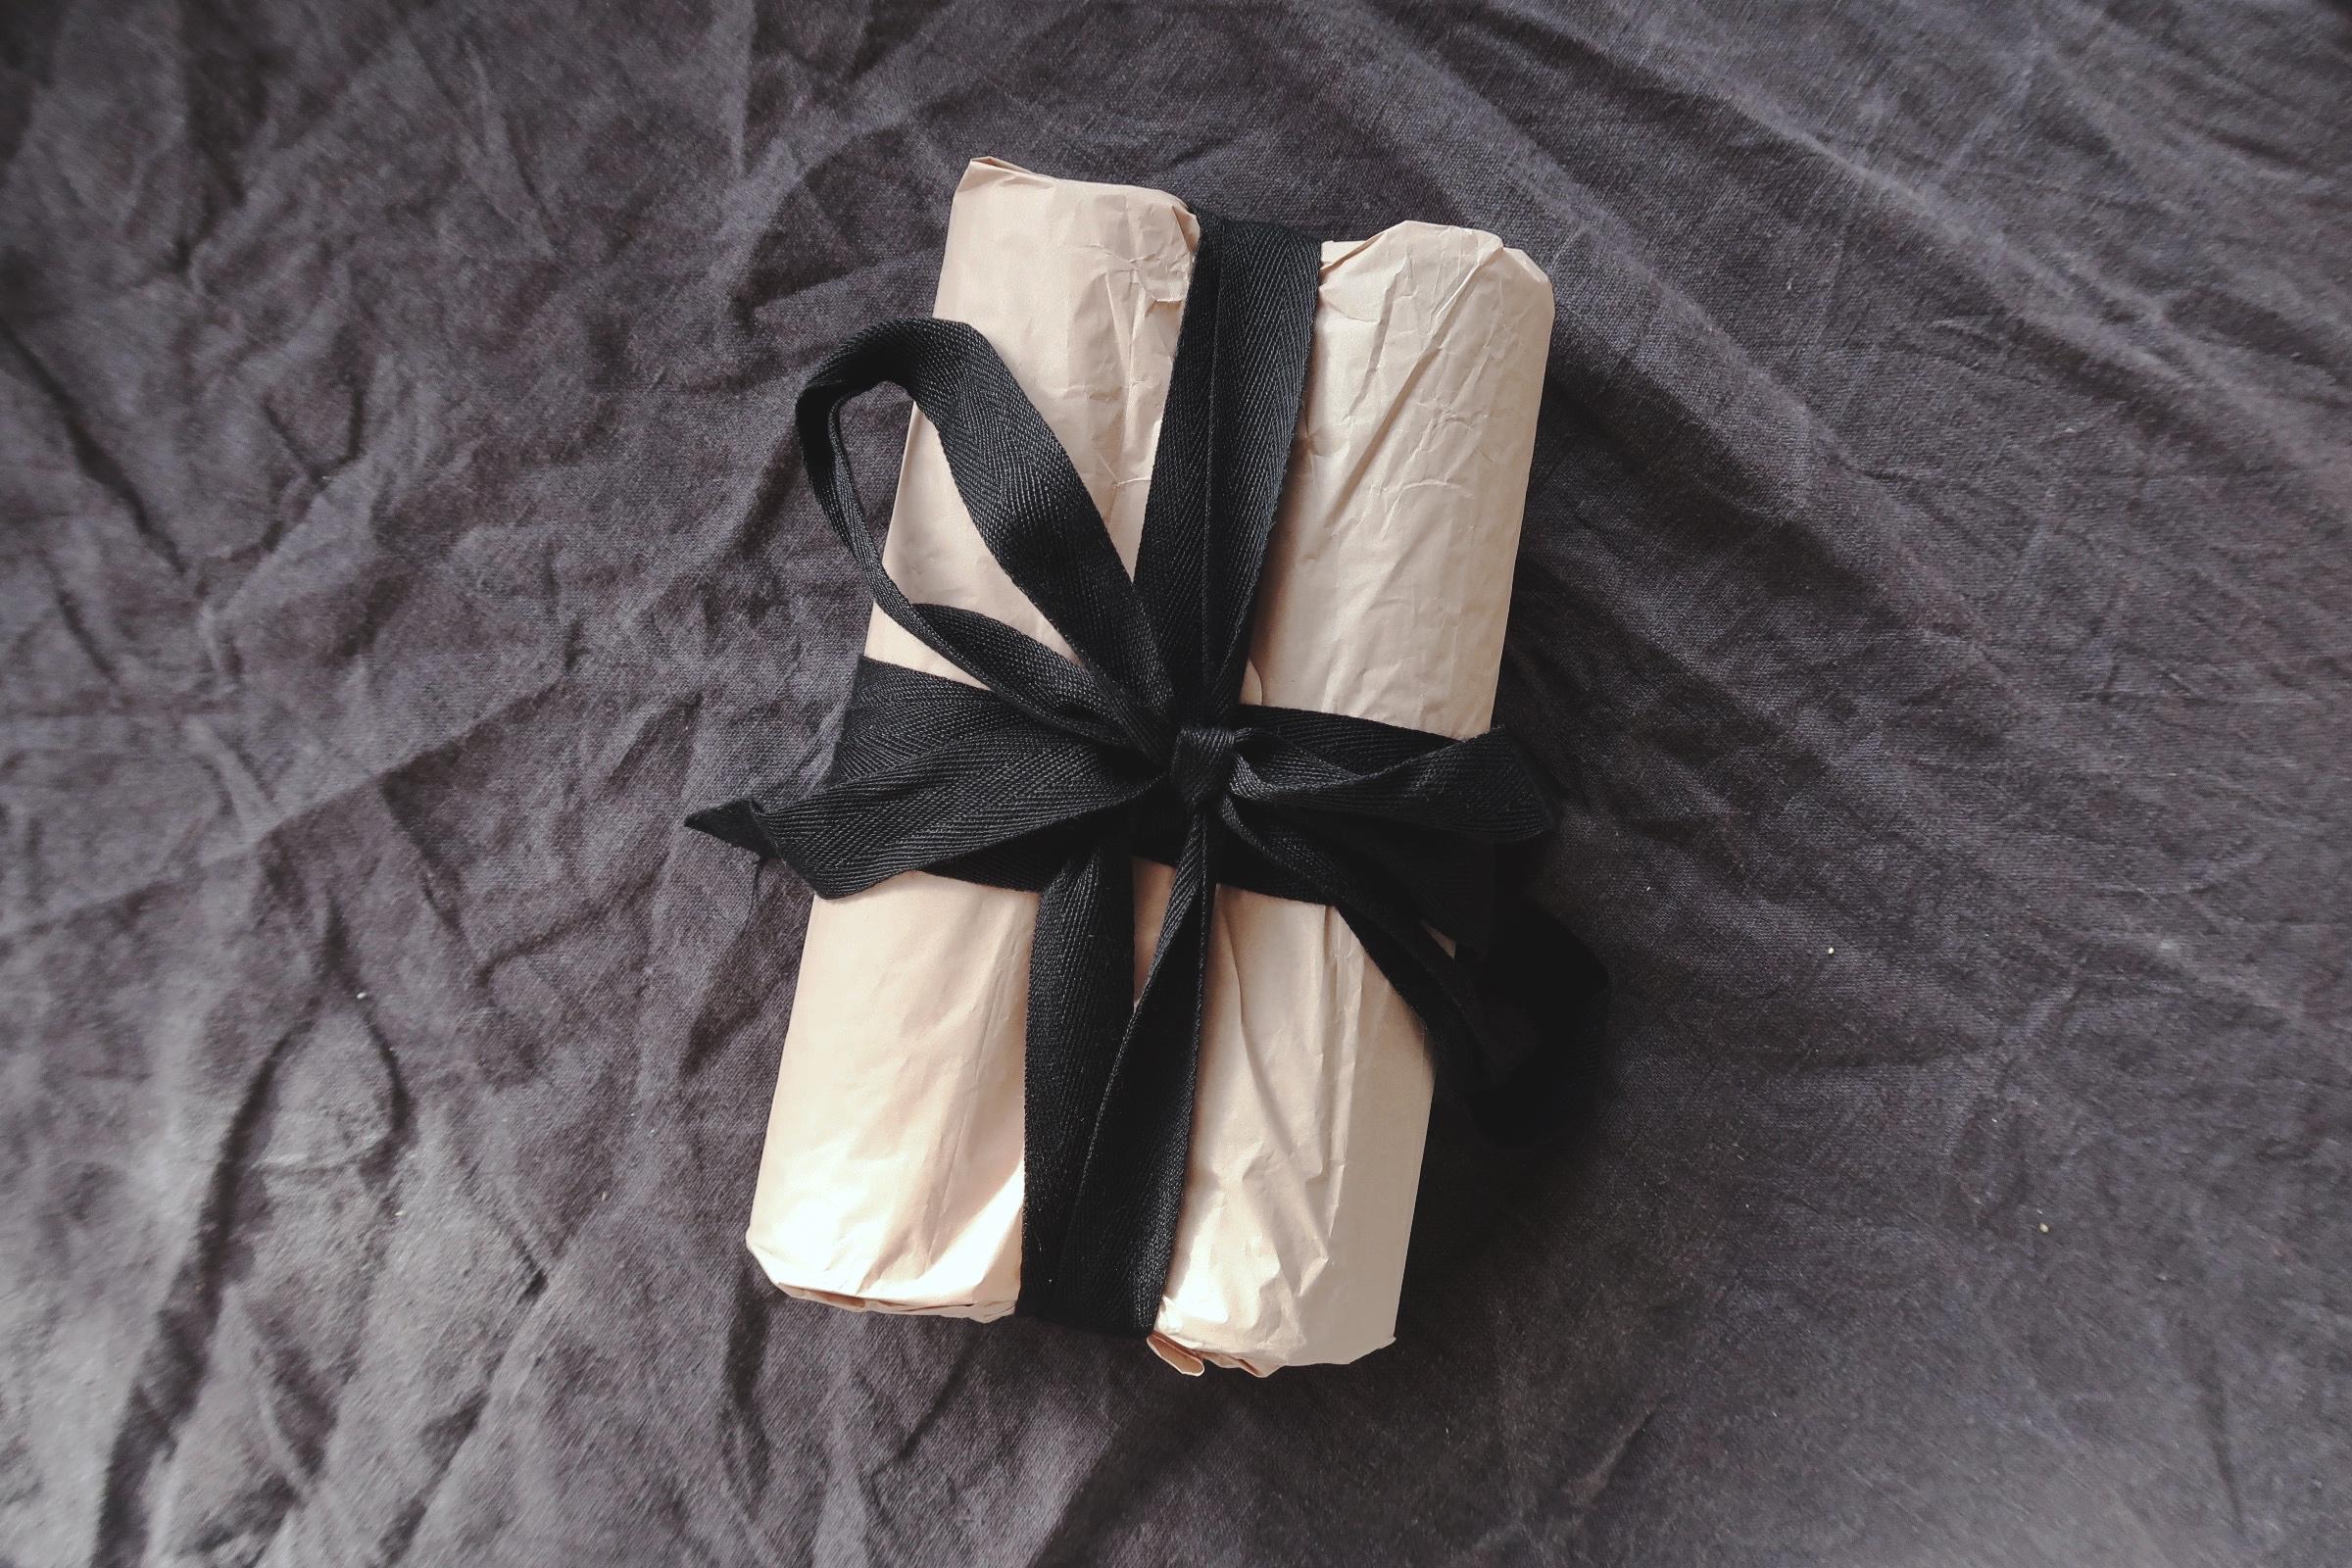 Paket inslaget med återbrukat material